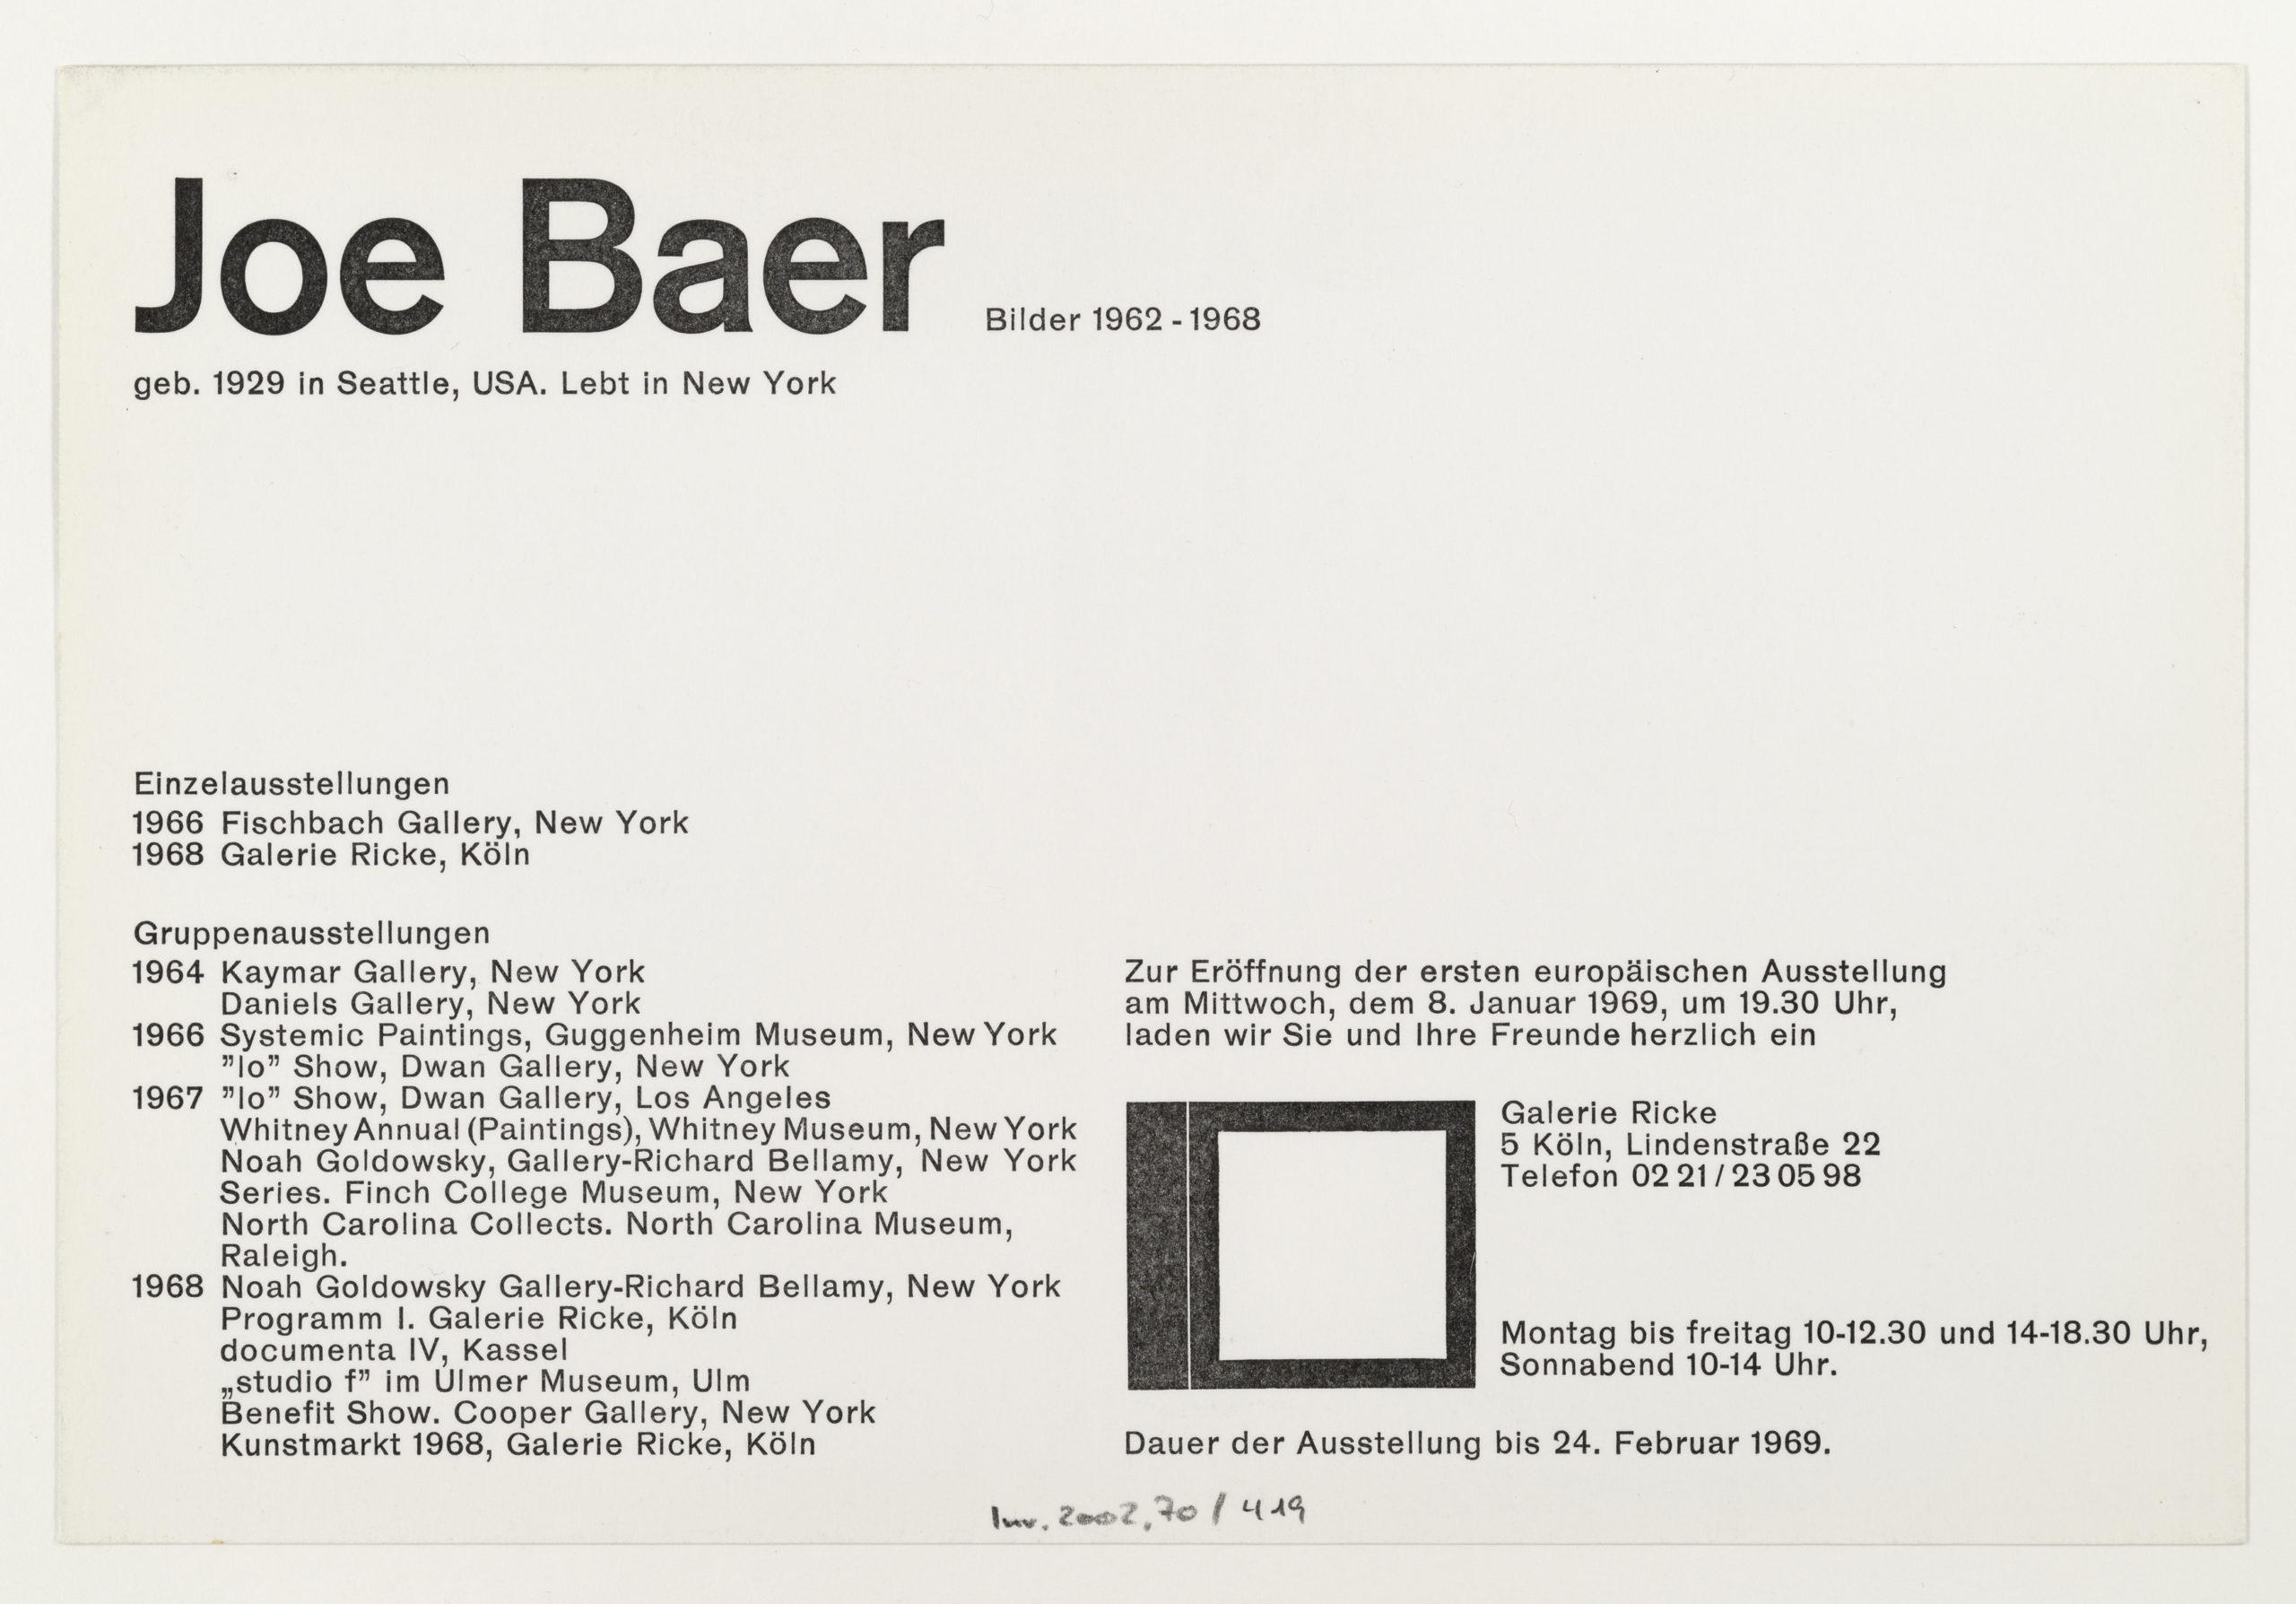 Jo Baer, Galerie Rolf Ricke, Cologne 1969 (Invitation); Sammlung Marzona, Kunstbibliothek – Staatliche Museen zu Berlin